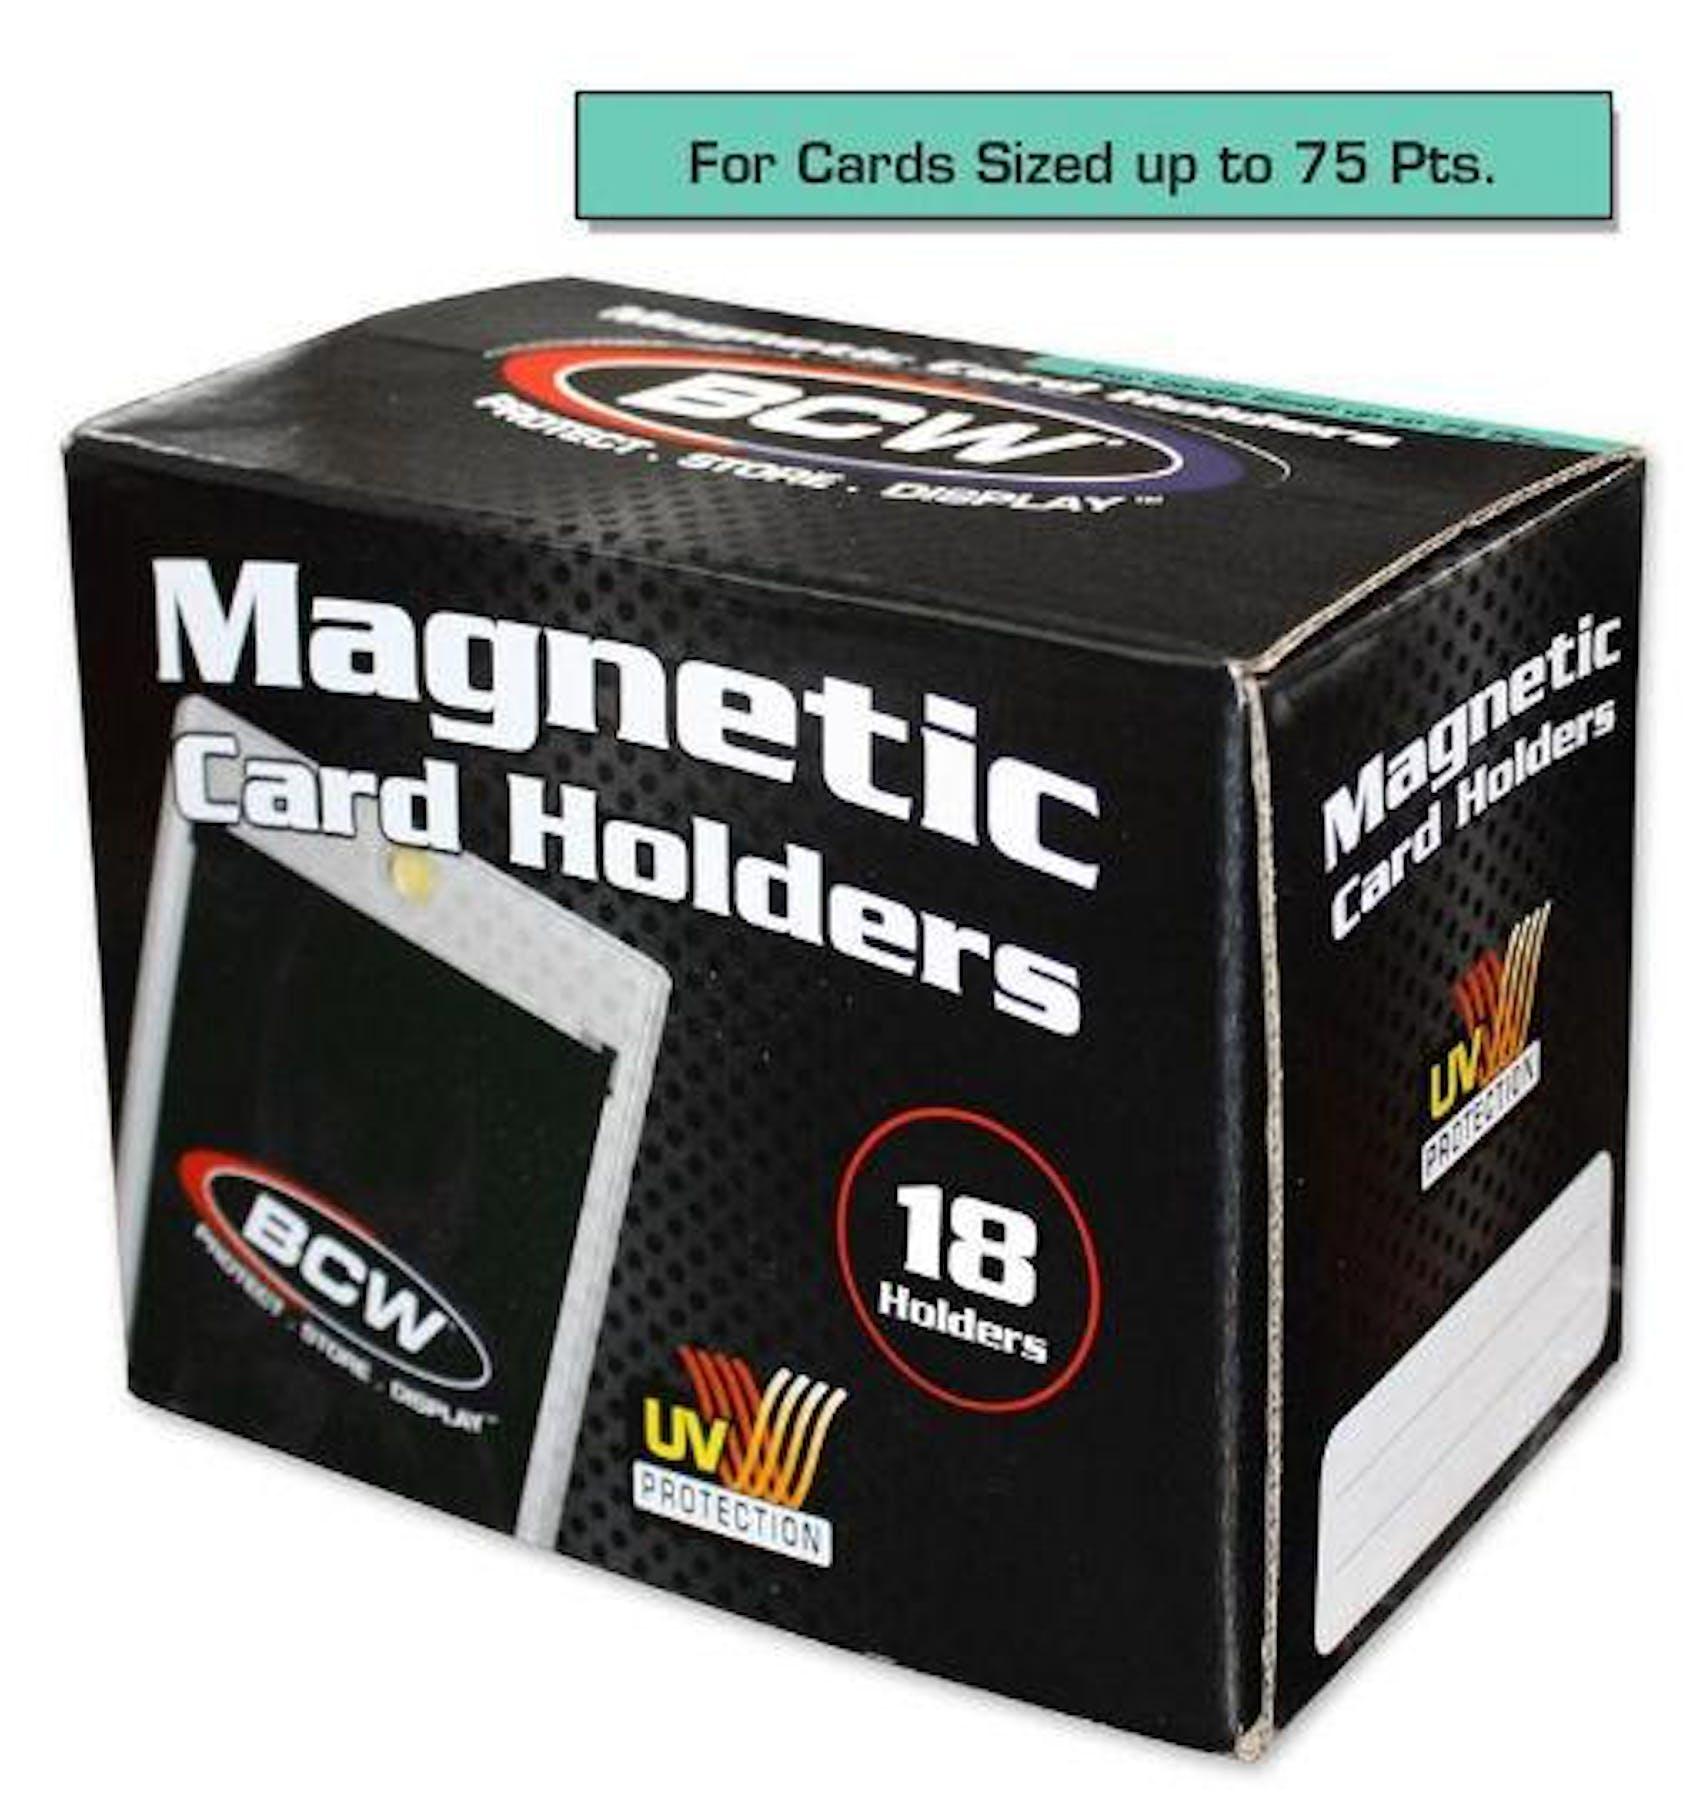 Bcw 75pt Magnetic Card Holder 18 Count Box Da Card World